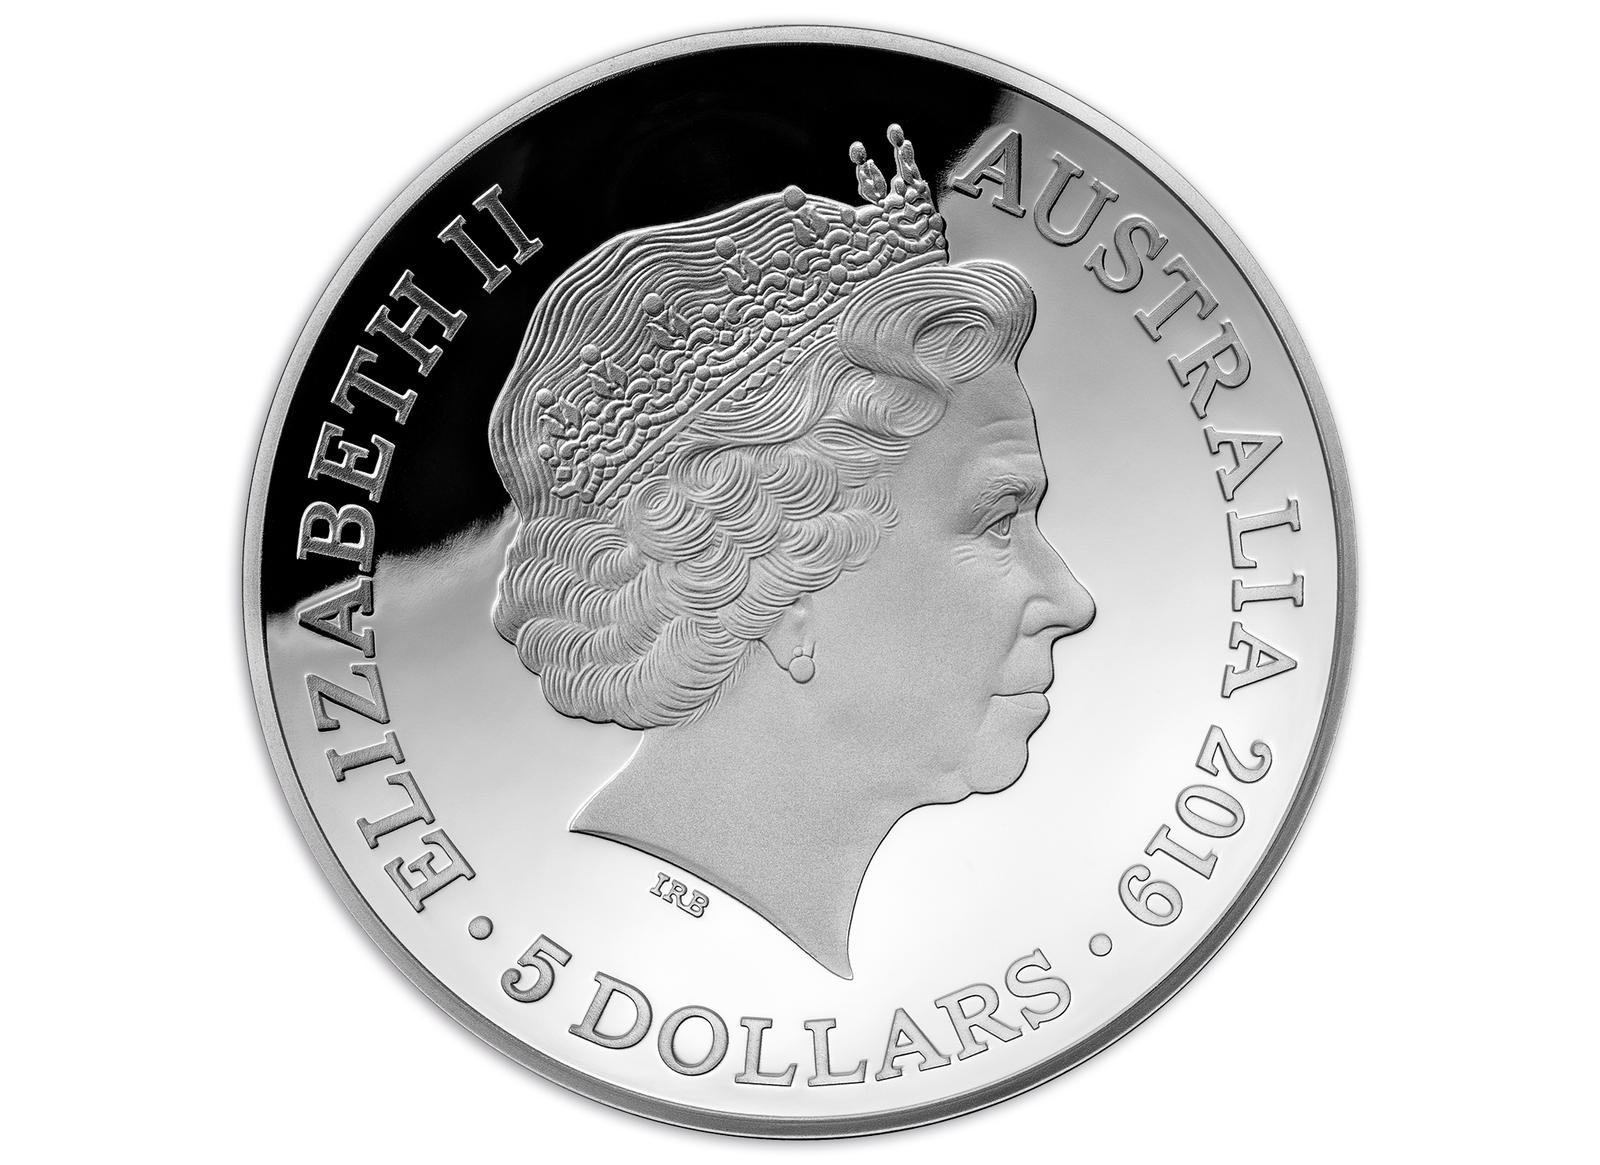 Coins Australia - 2019 $5 1oz Fine Silver Proof 1812 A New